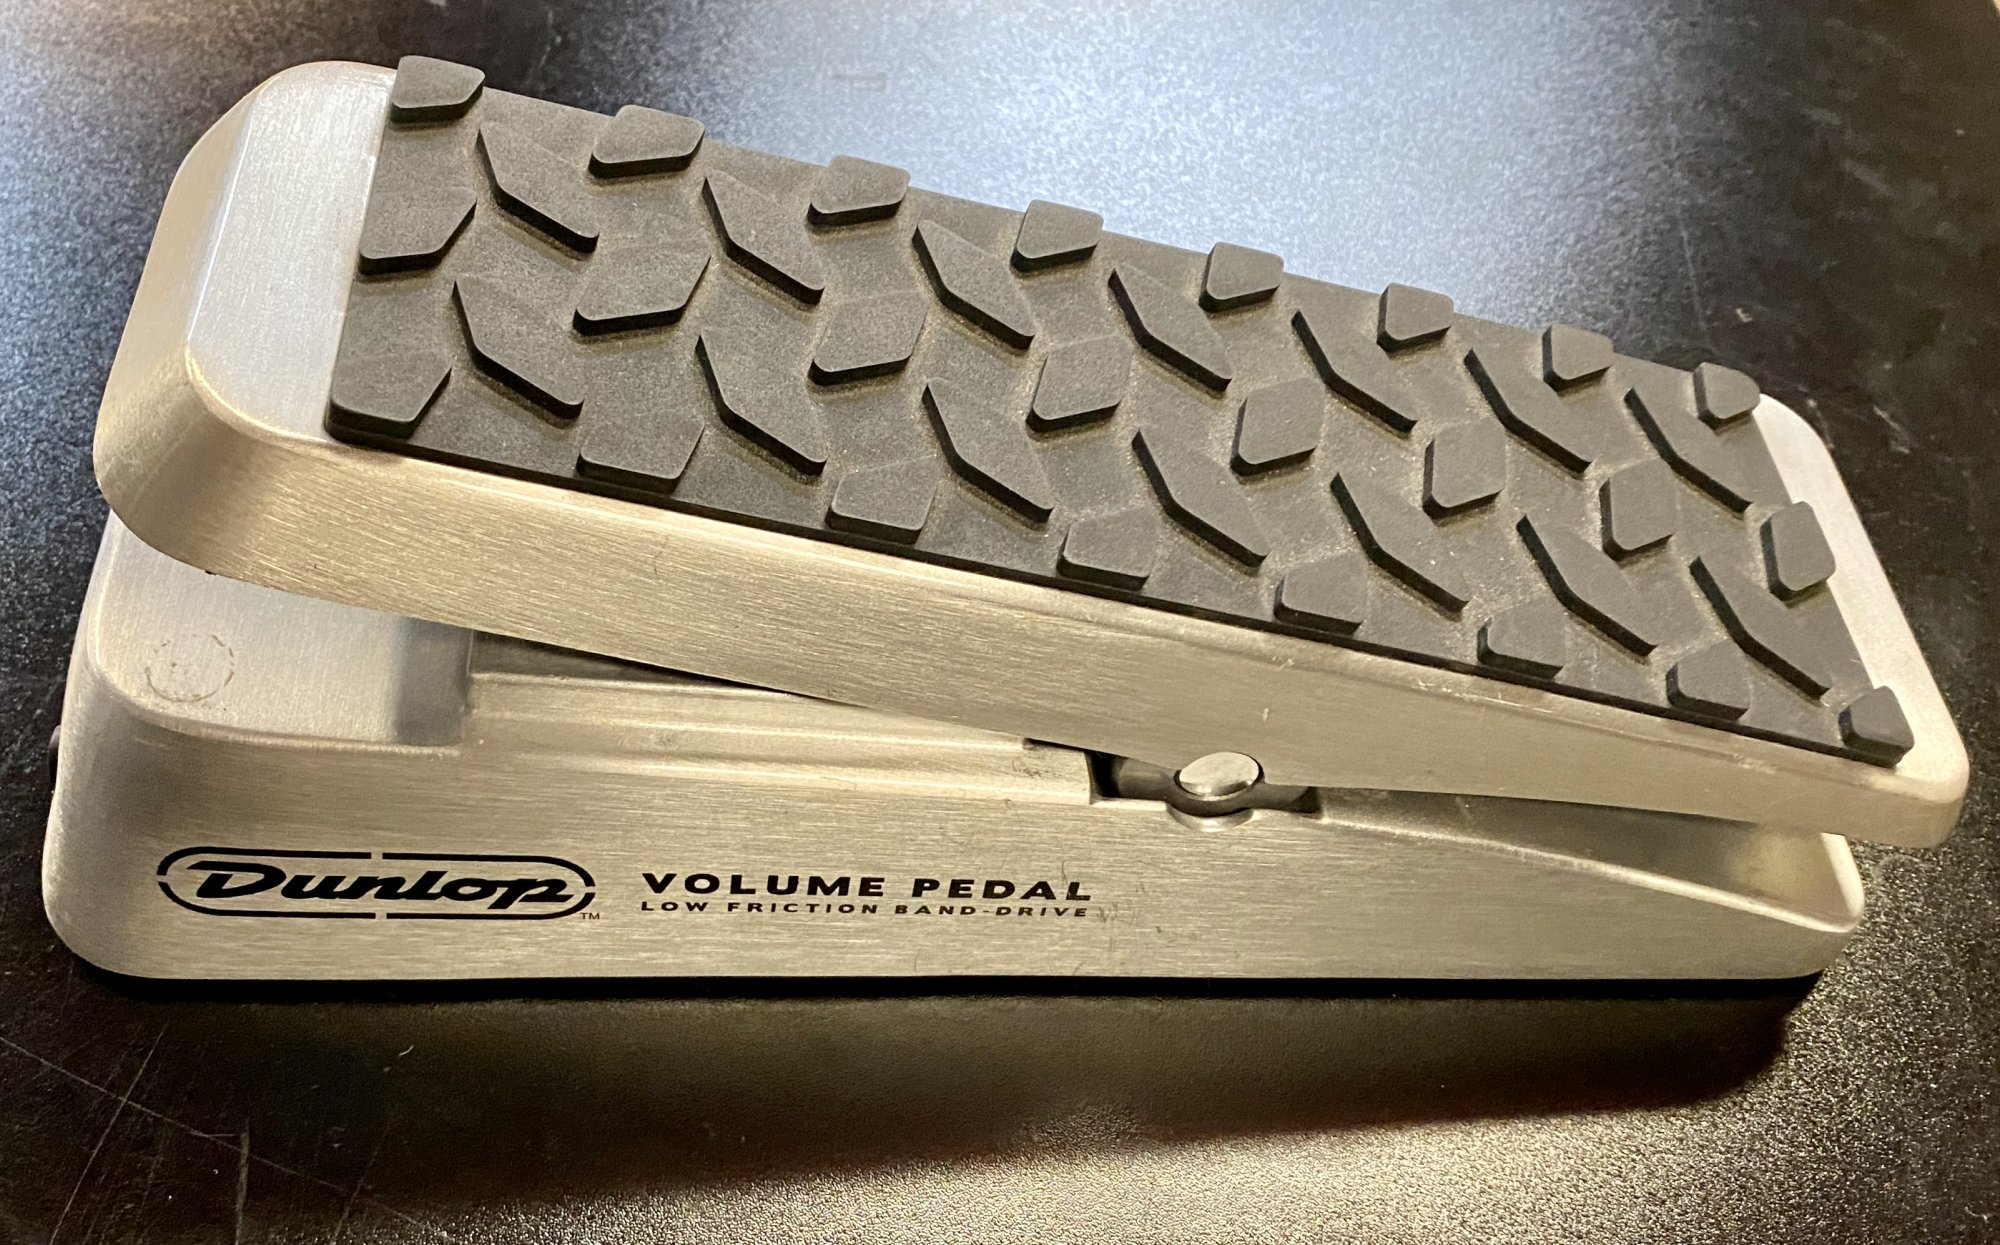 USED - Dunlop DVP1 Volume Pedal